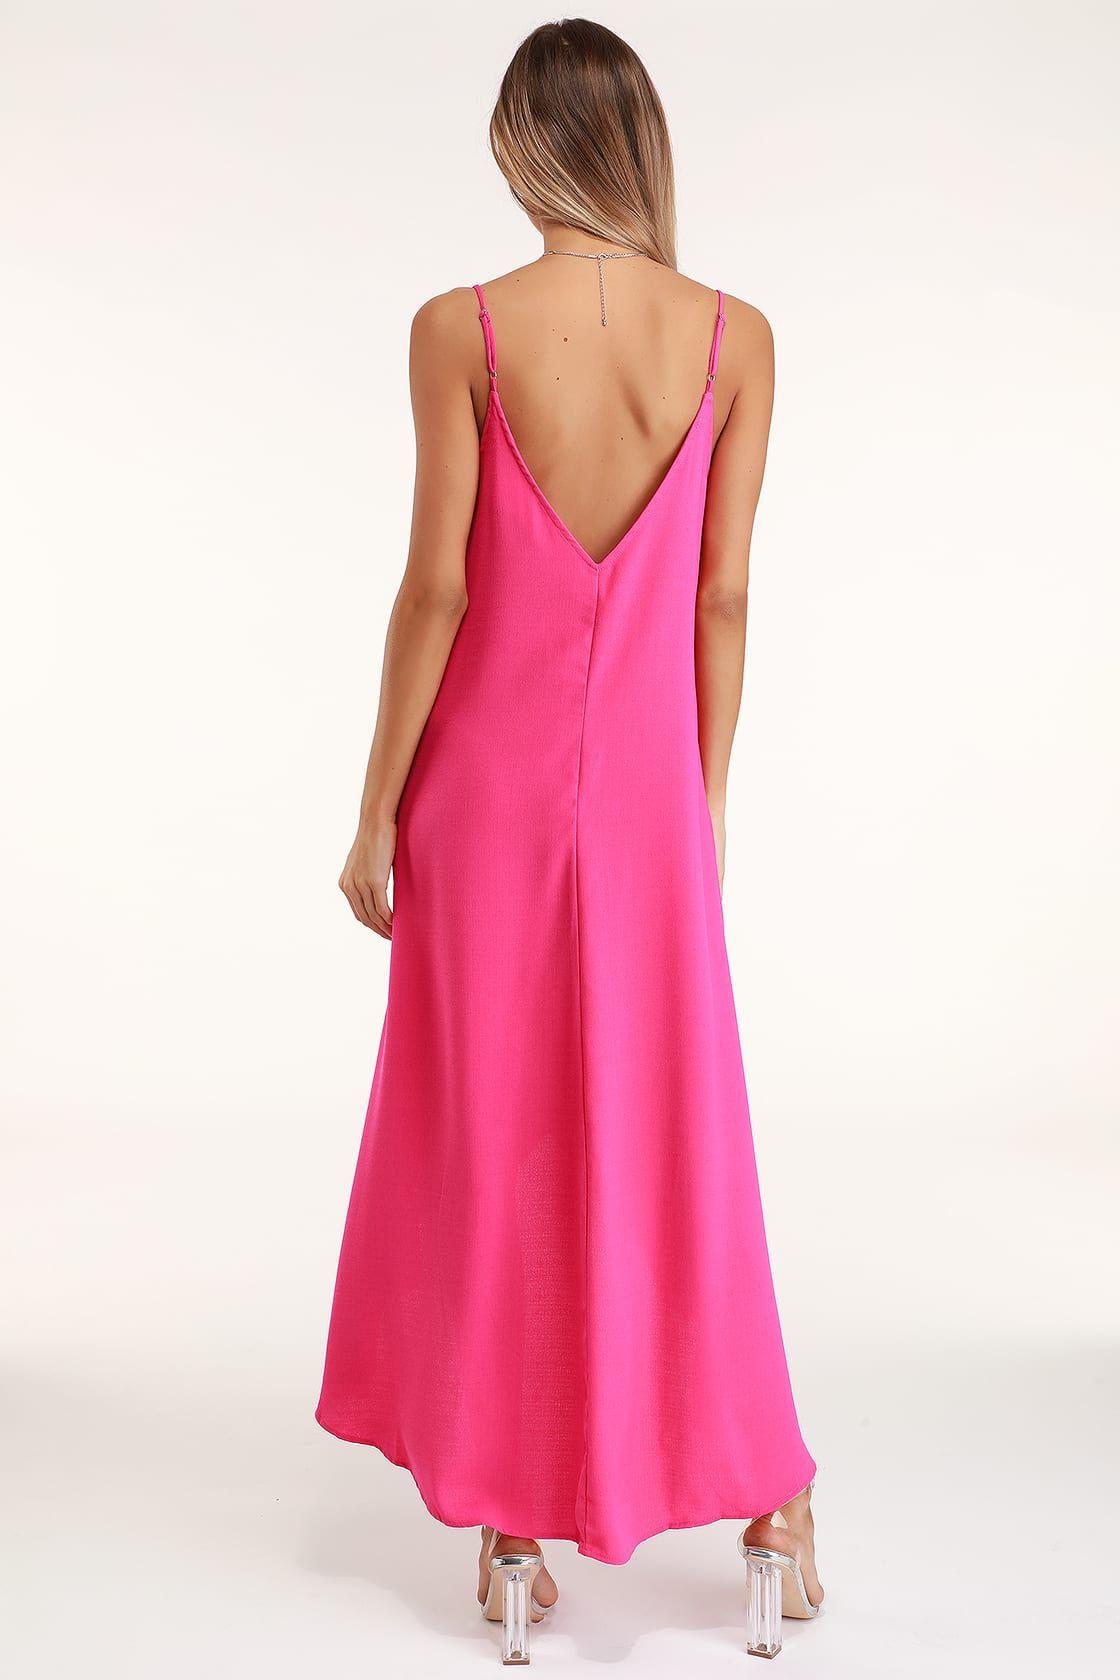 Sweet Surprise Bright Pink High Low Maxi Dress High Low Maxi Dress Bright Pink Dresses Bright Pink Maxi Dress